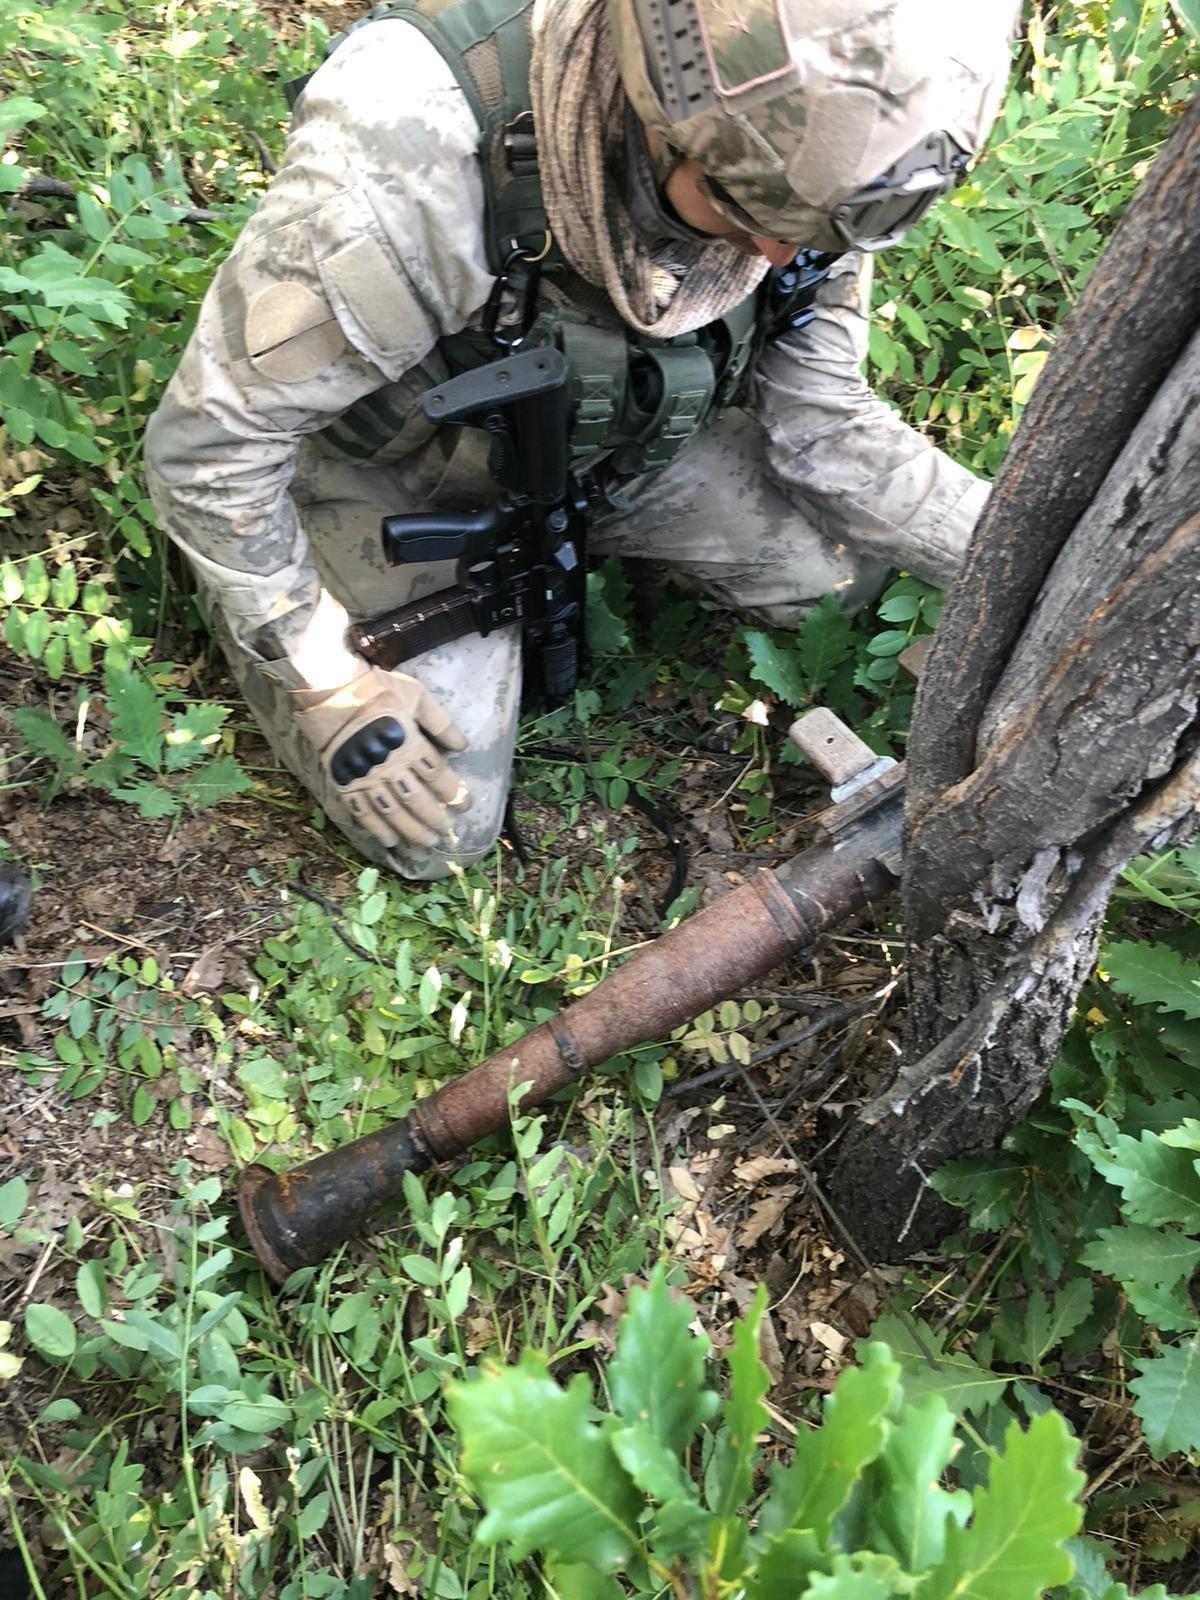 Turkish security forces seized ammunition belonging to the PKK terrorist group in eastern Tunceli province, Turkey, July 6, 2021. (AA Photo)